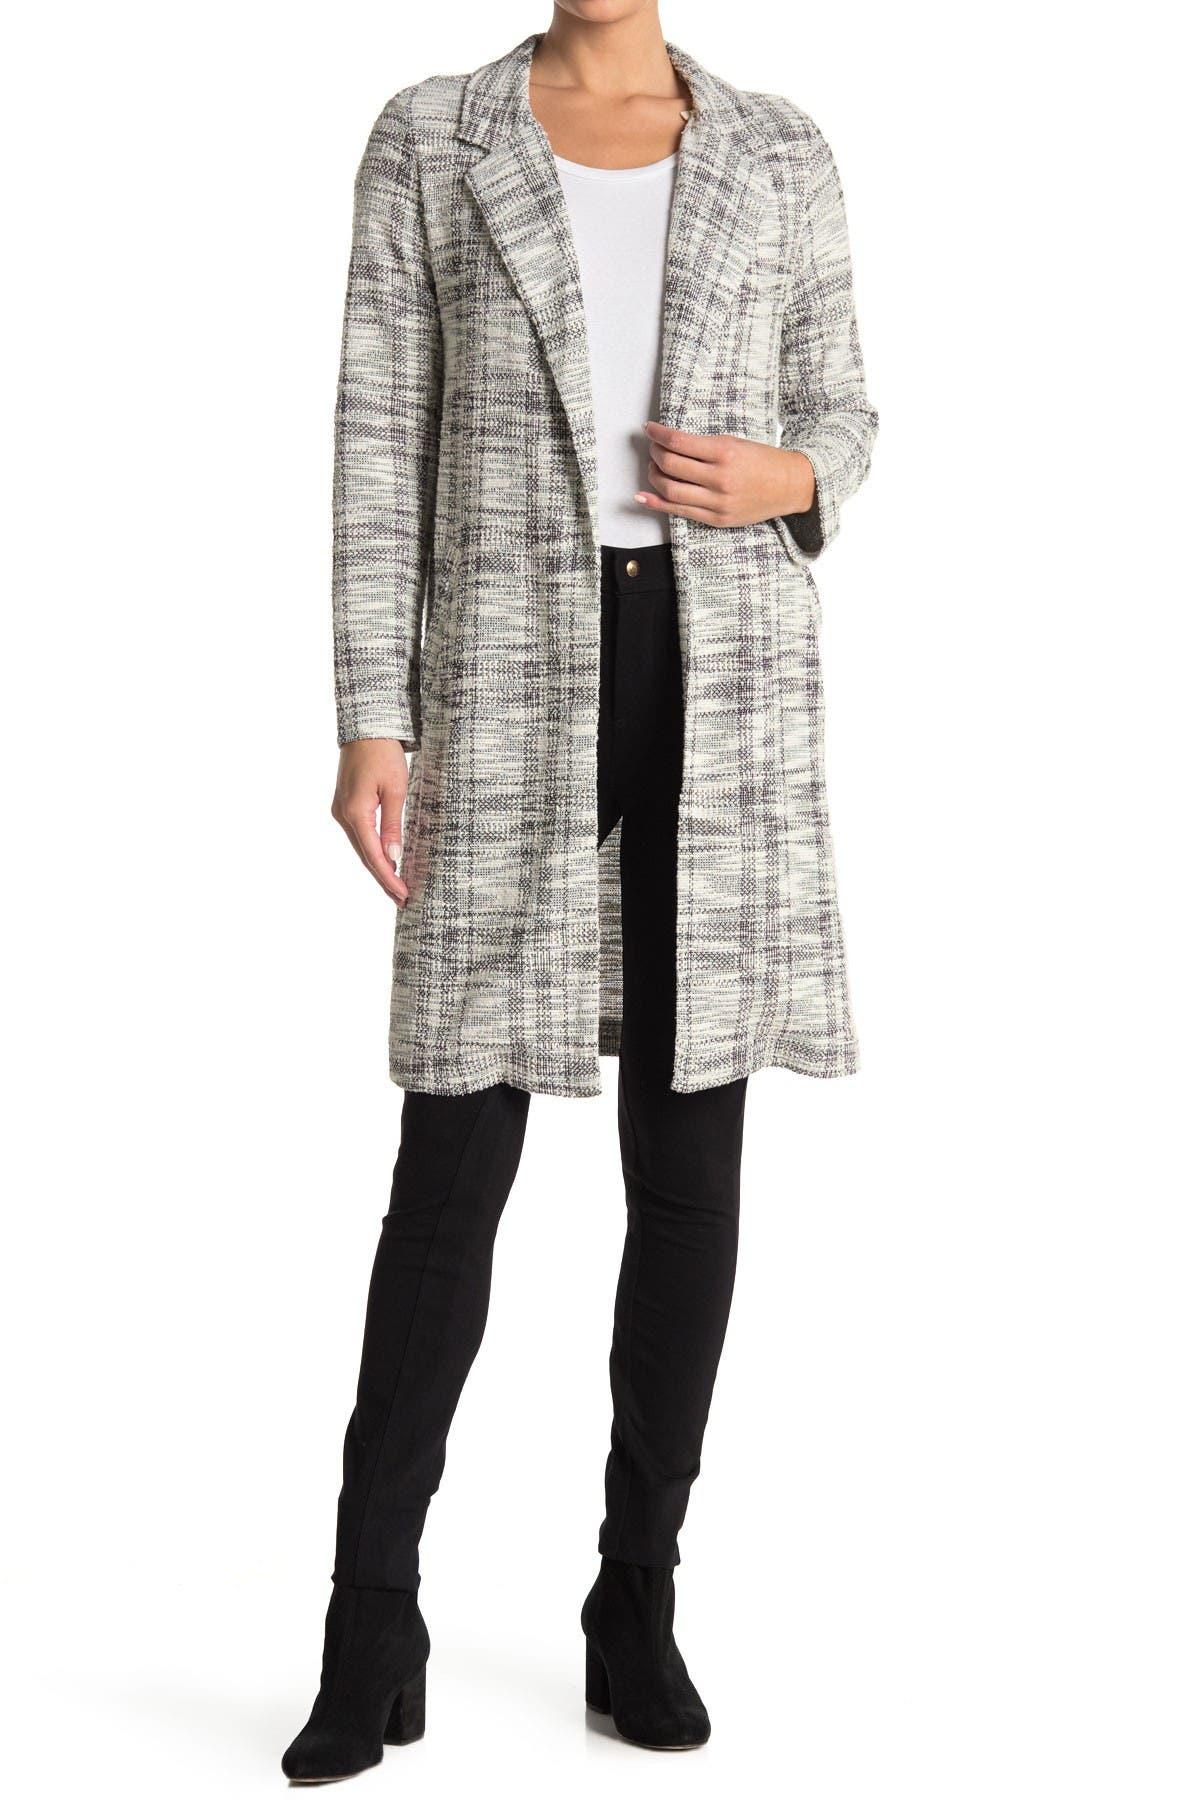 Image of MELLODAY Notch Lapel Long Knit Jacket